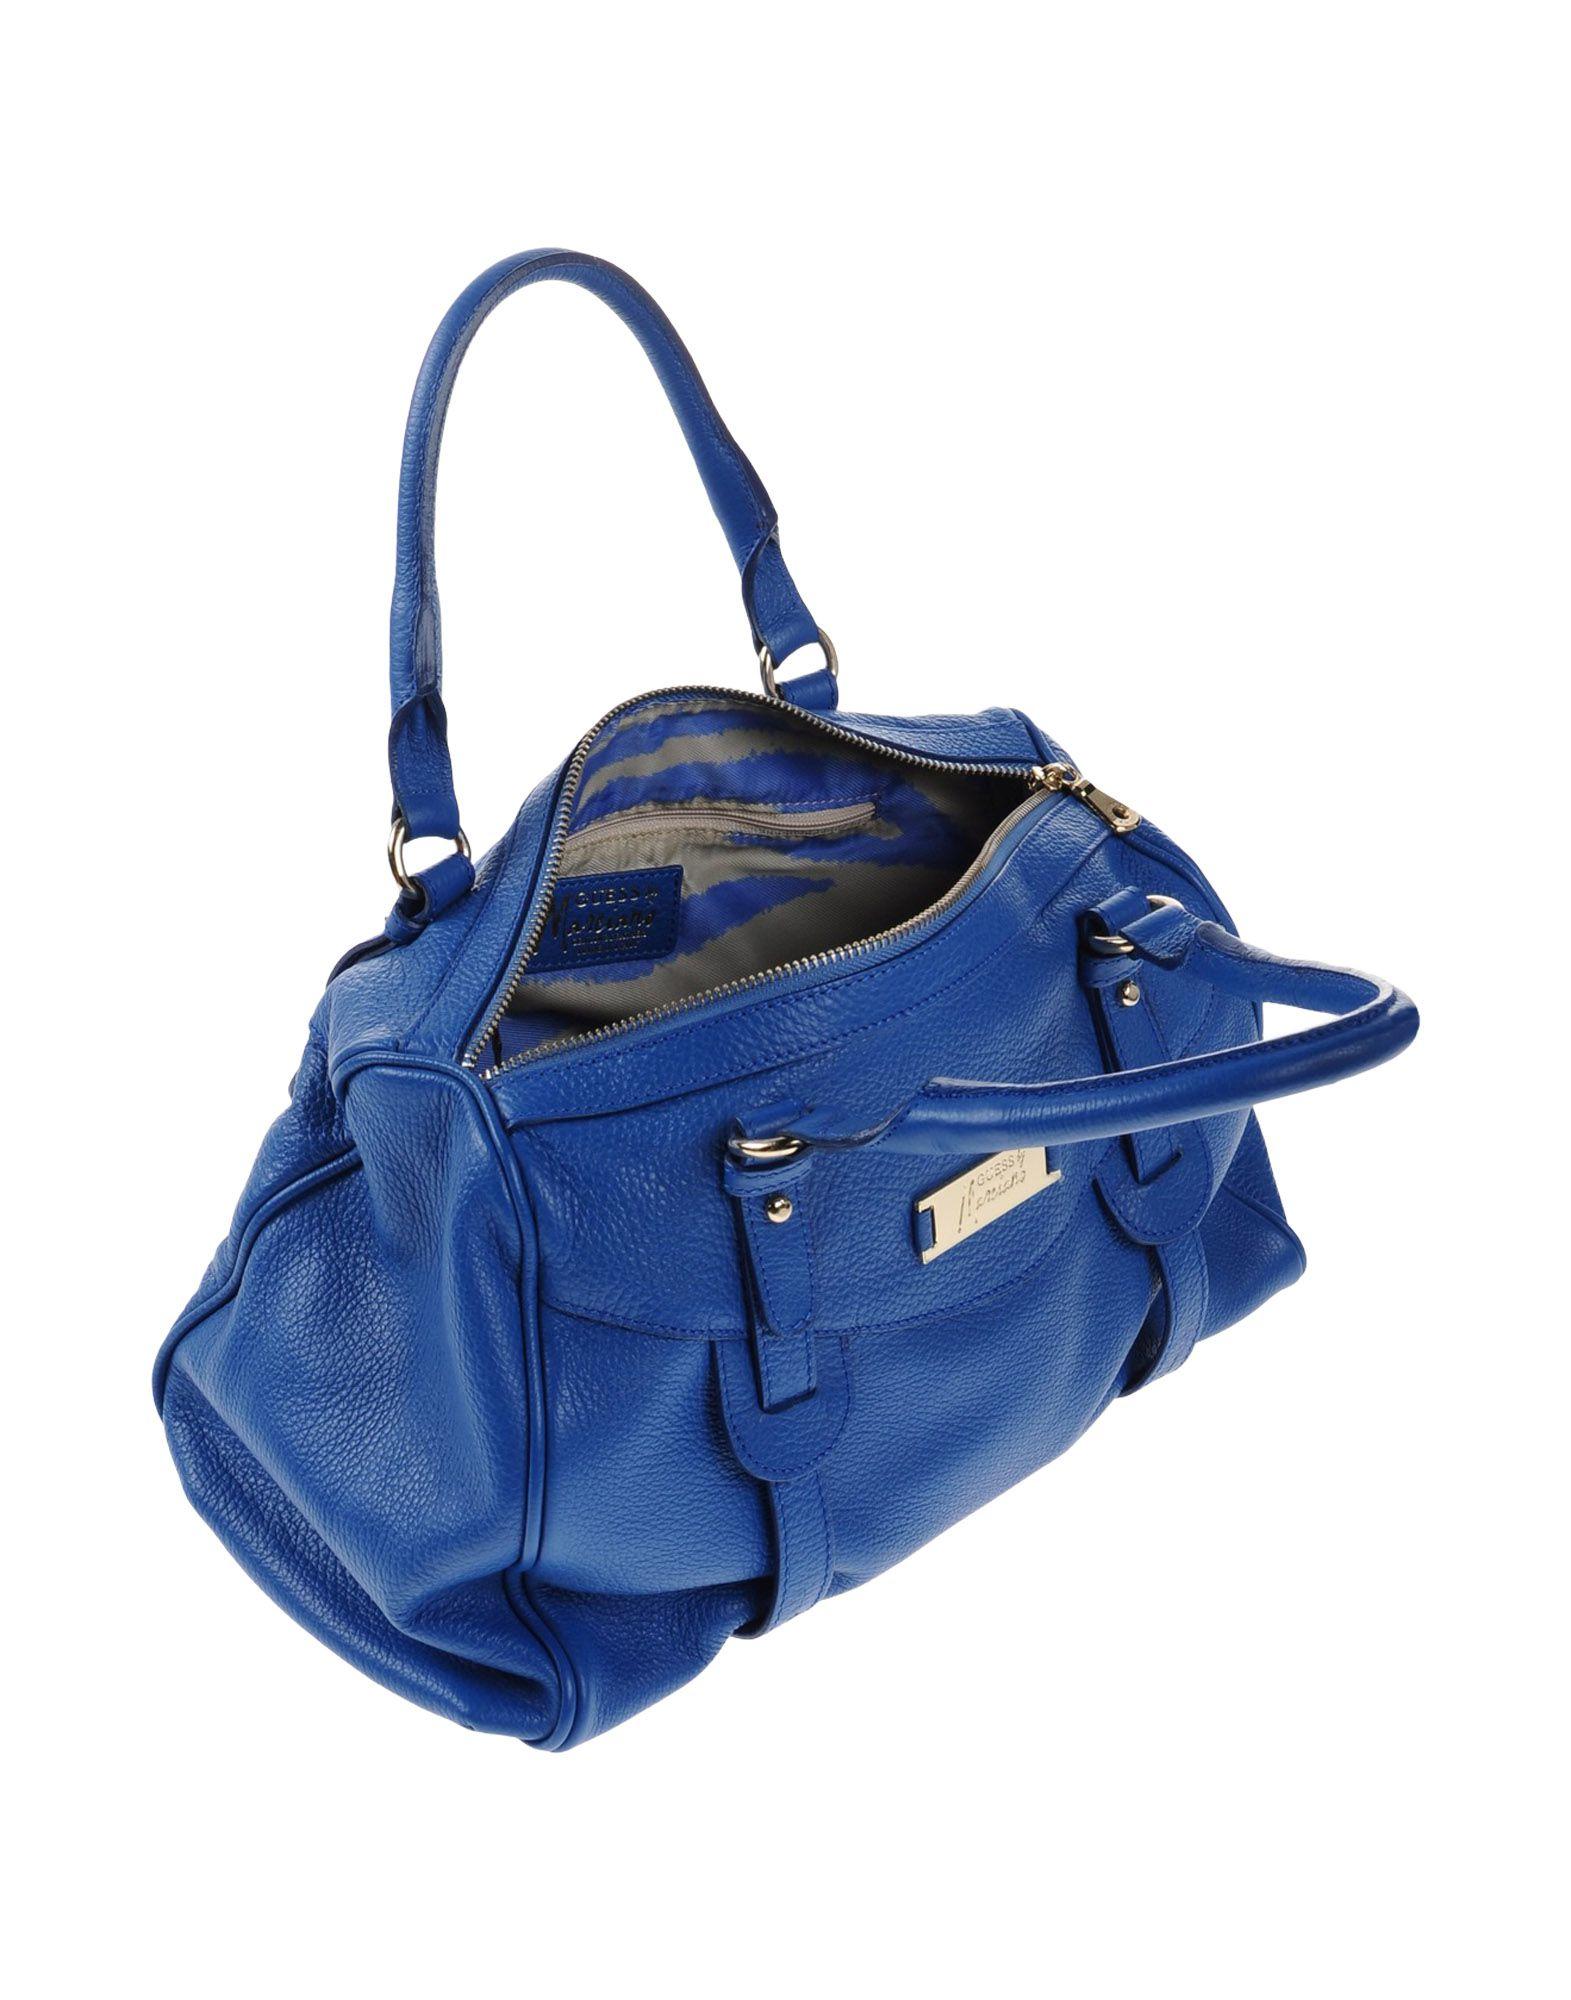 5943bacb6213 Guess Blue Handbag - Foto Handbag All Collections Salonagafiya.Com